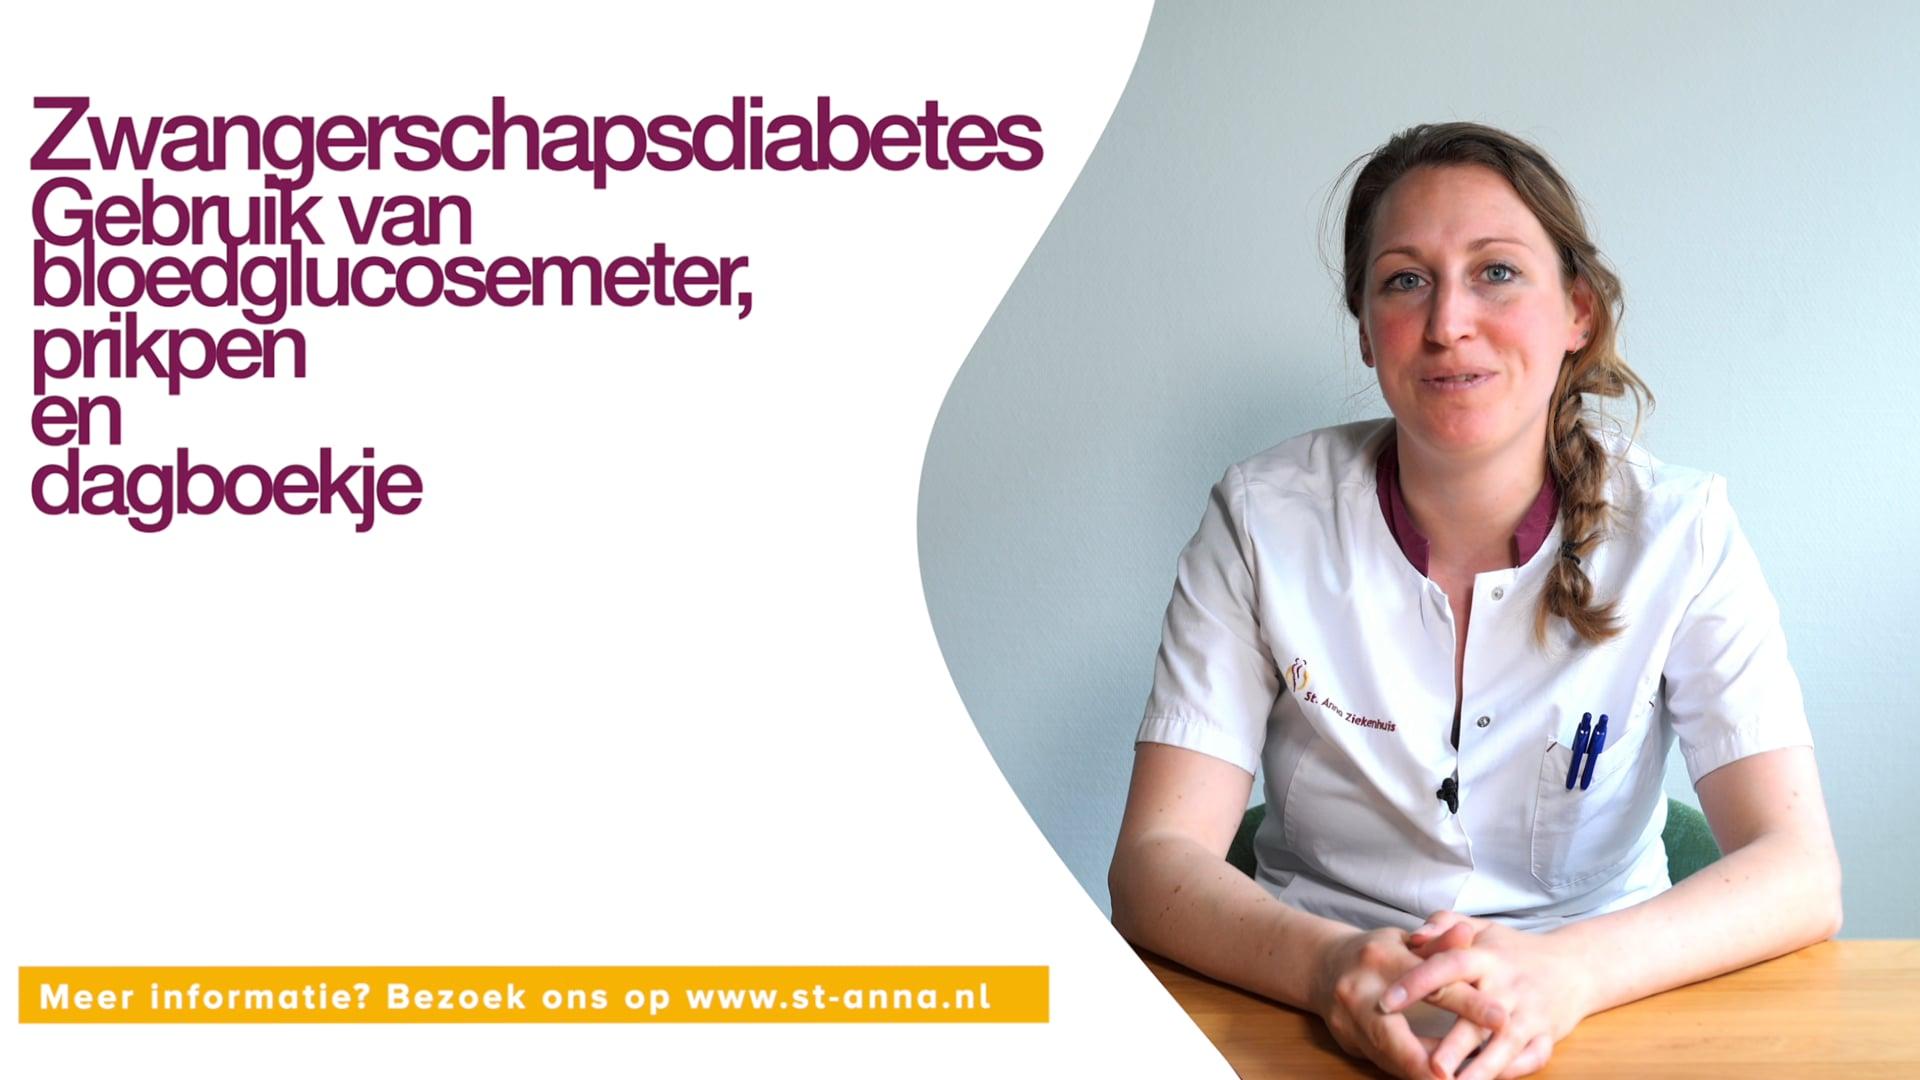 St. Annaziekenhuis - Zwangerschap diabetes | Gebruik van bloedgluscosemeter, prikben en dagboek